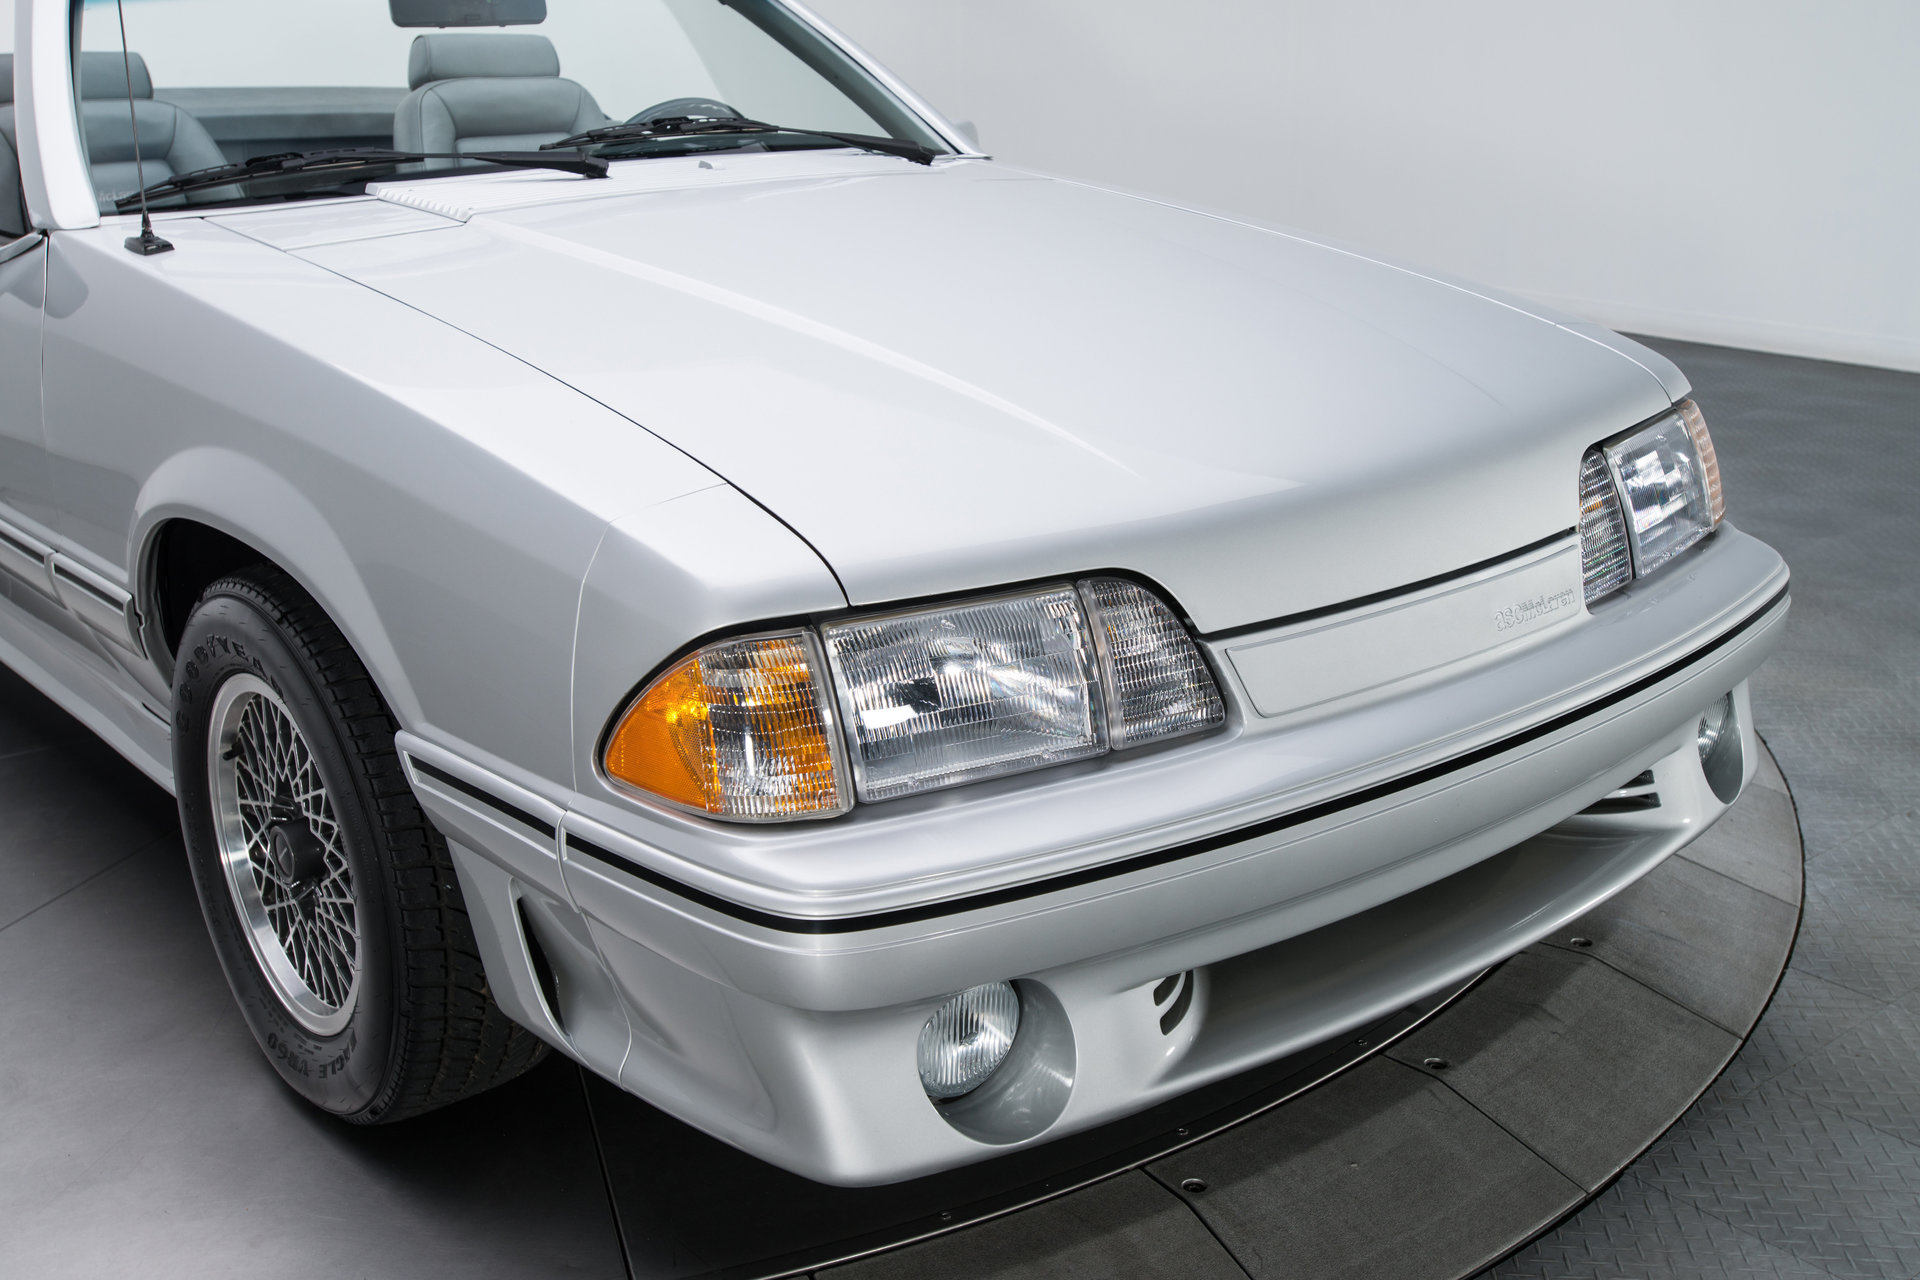 1988 Ford Mustang Asc Mclaren For Sale 81582 Mcg Fog Lights